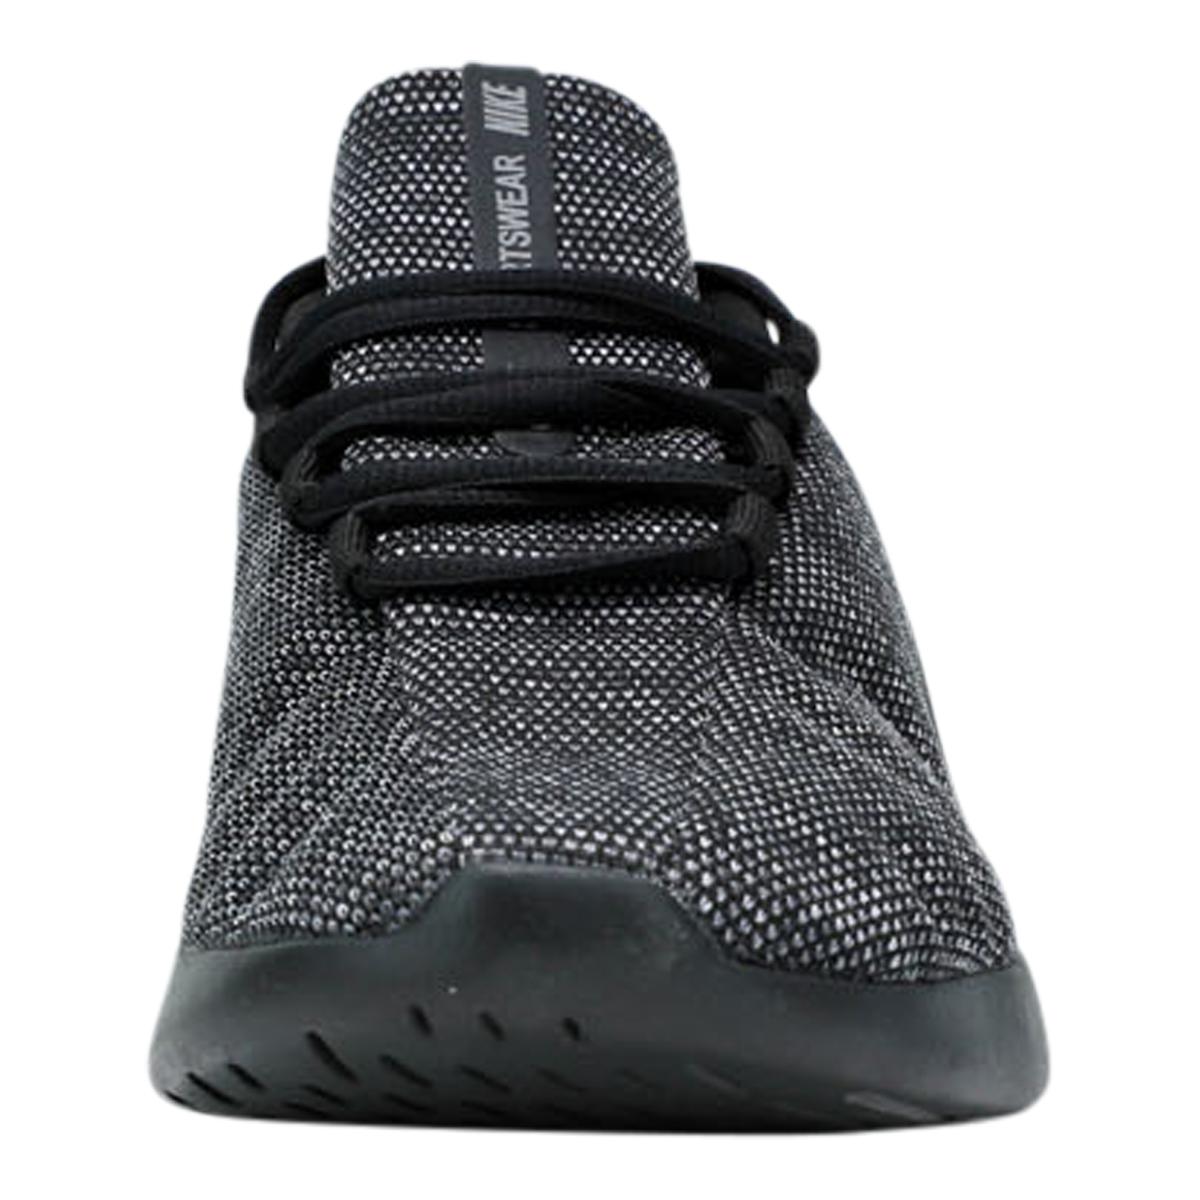 Nike-Men-039-s-Viale-Premium-Running-Shoes thumbnail 4